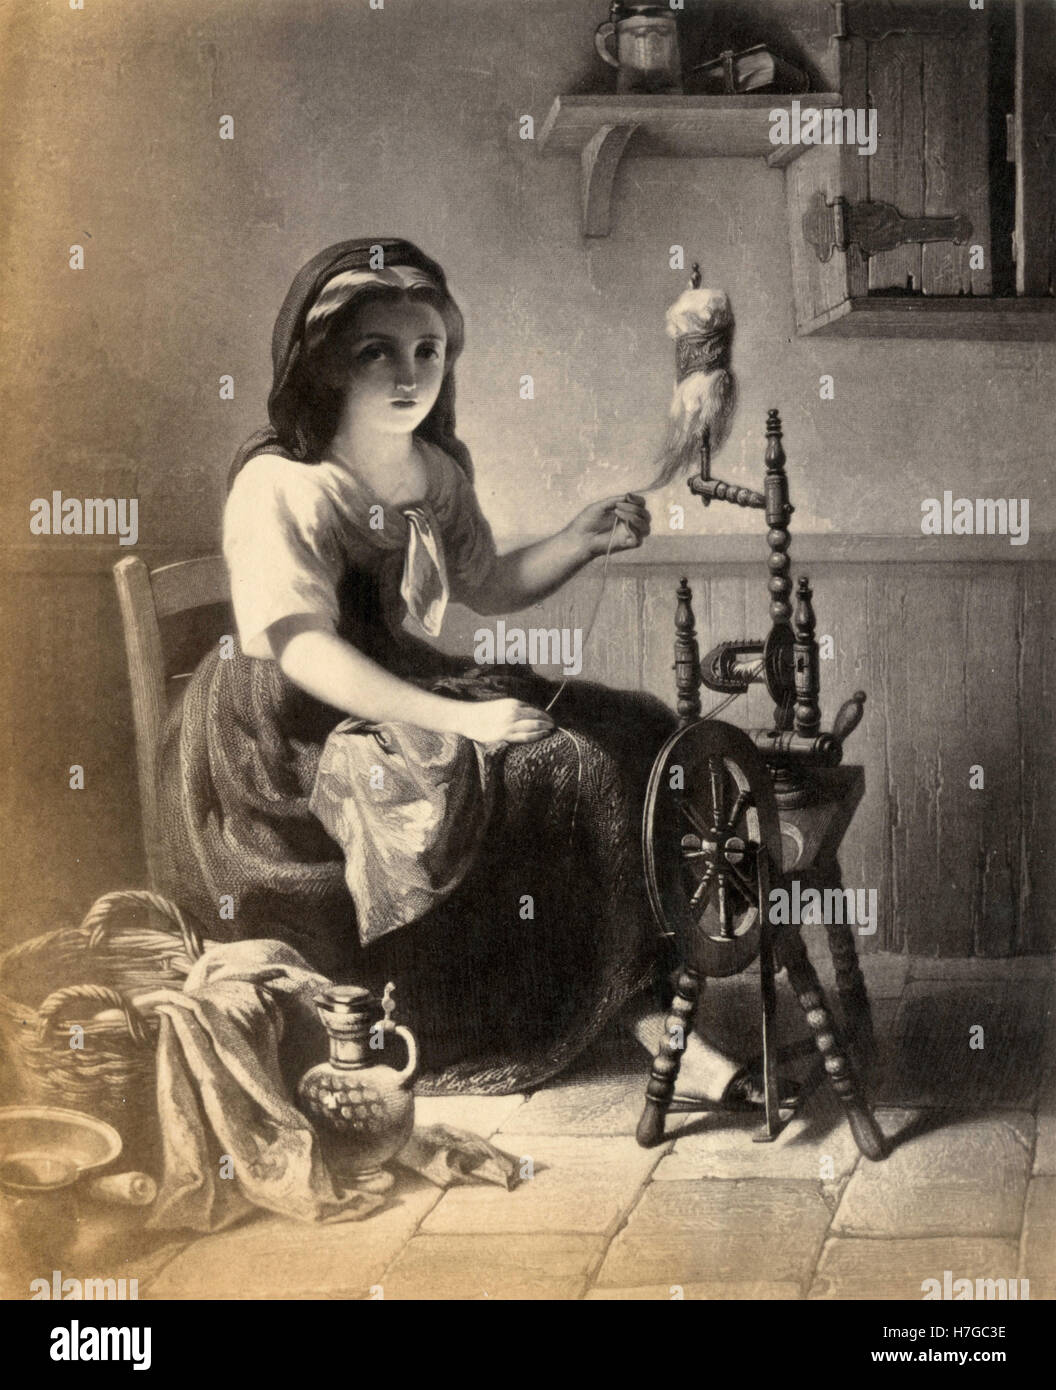 Mujer hilando lana, imprimir Foto de stock